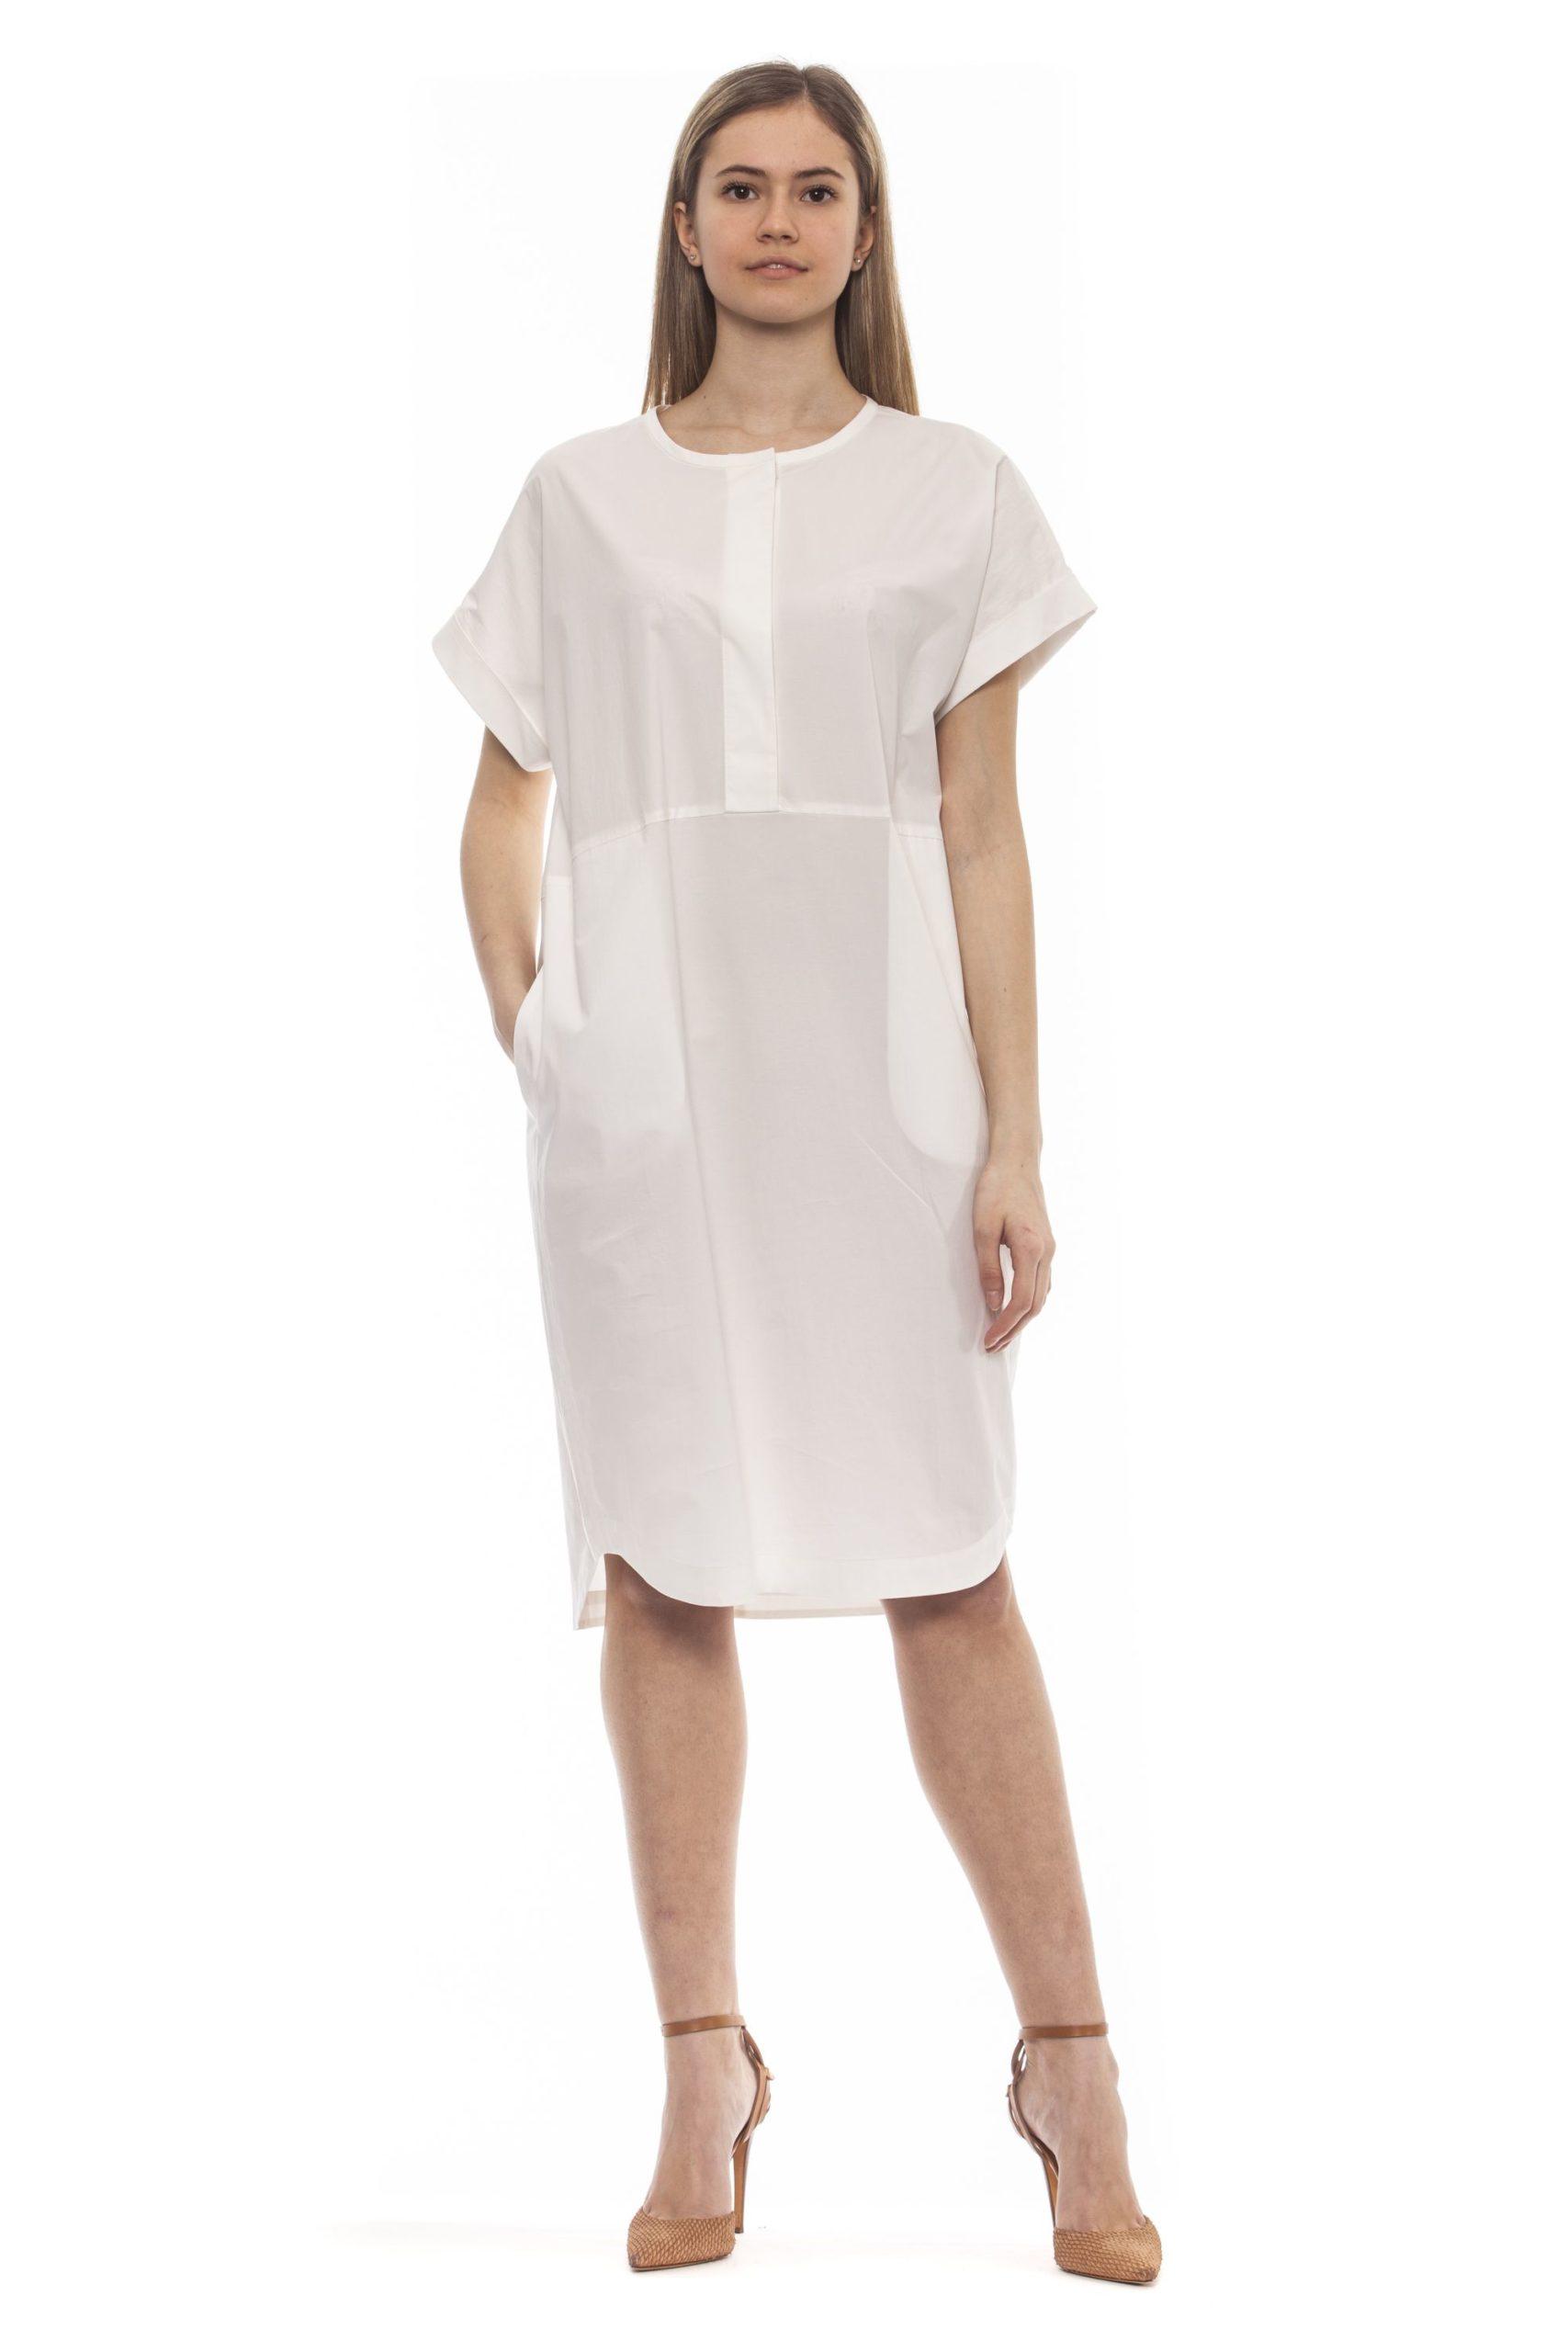 Peserico Women's Bianco Dress White PE1383236 - IT42   S